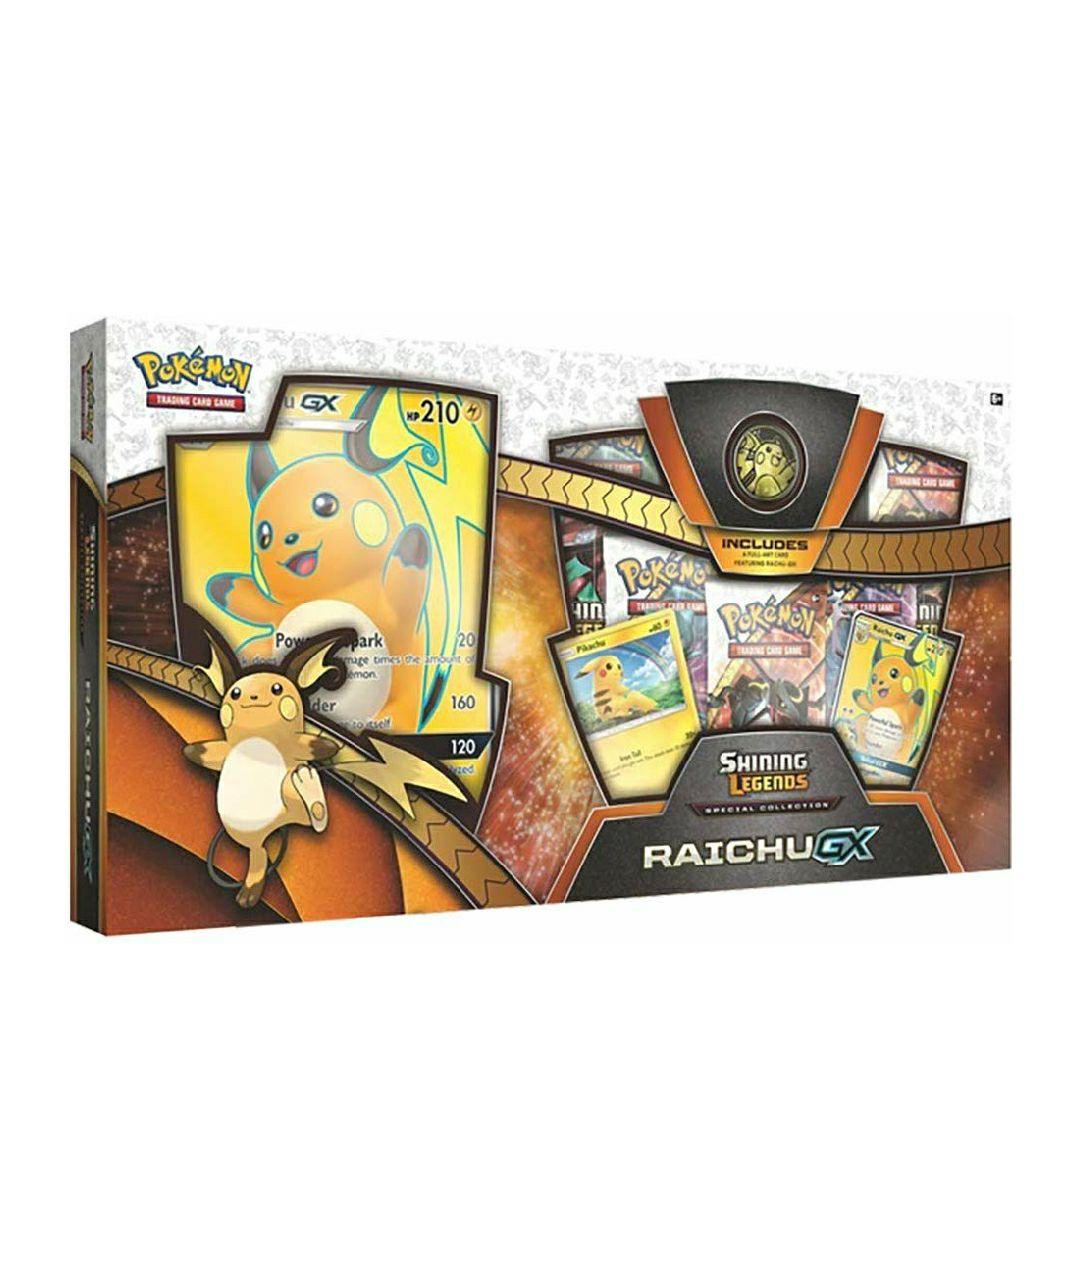 Pokemon JCC Colección Especial Raichu-GX de Leyendas Luminosas - Español